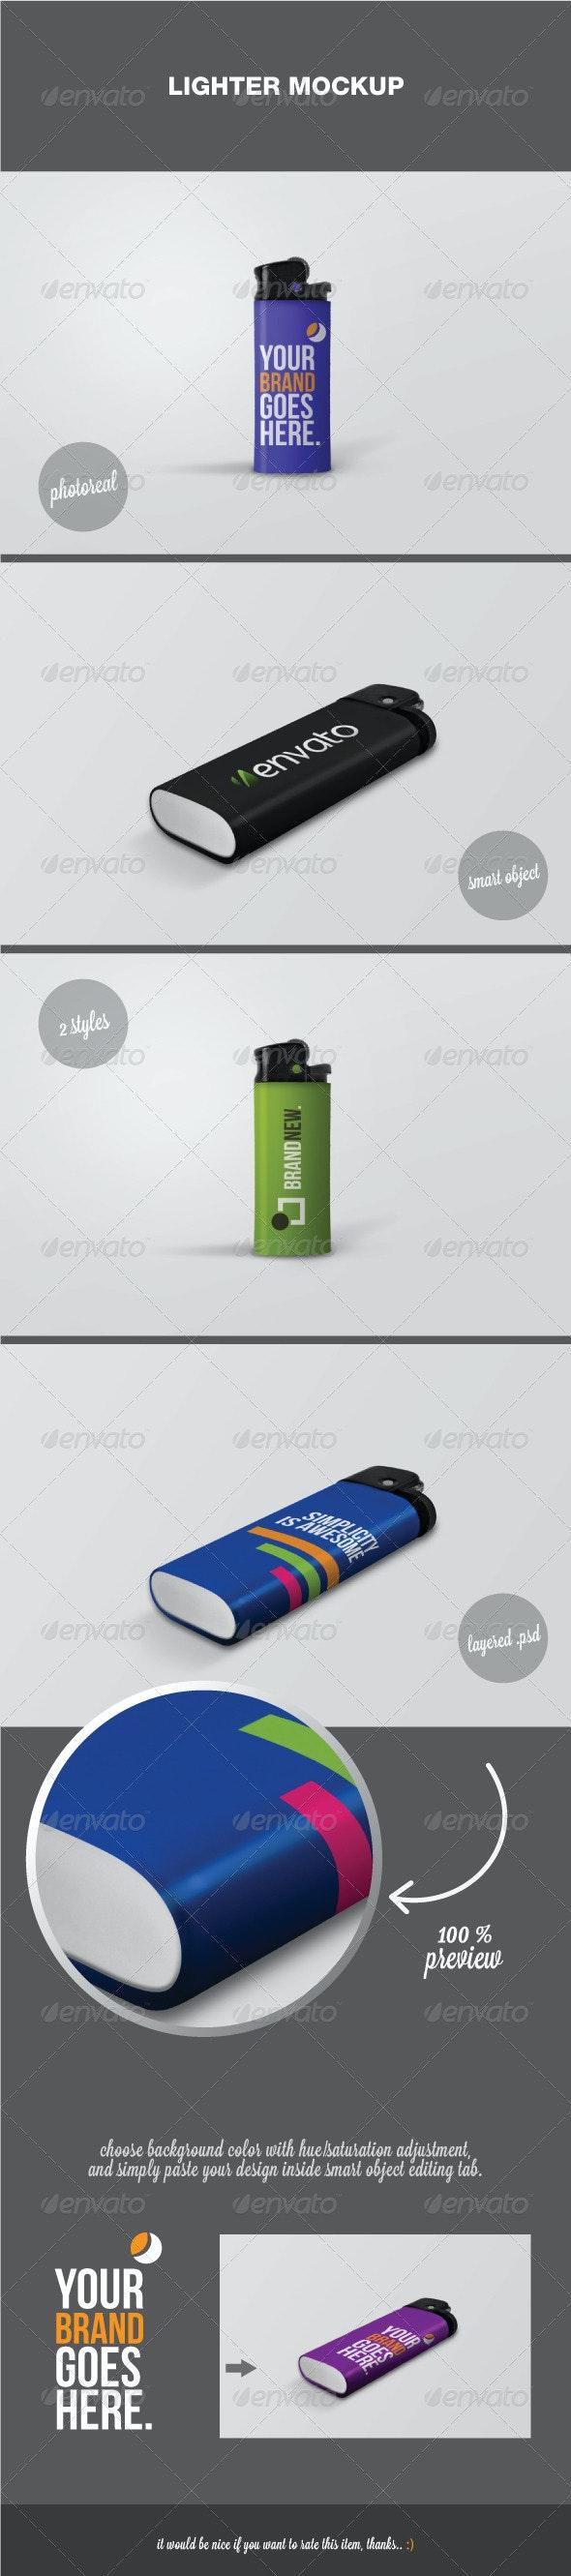 Lighter Mockup - Miscellaneous Product Mock-Ups